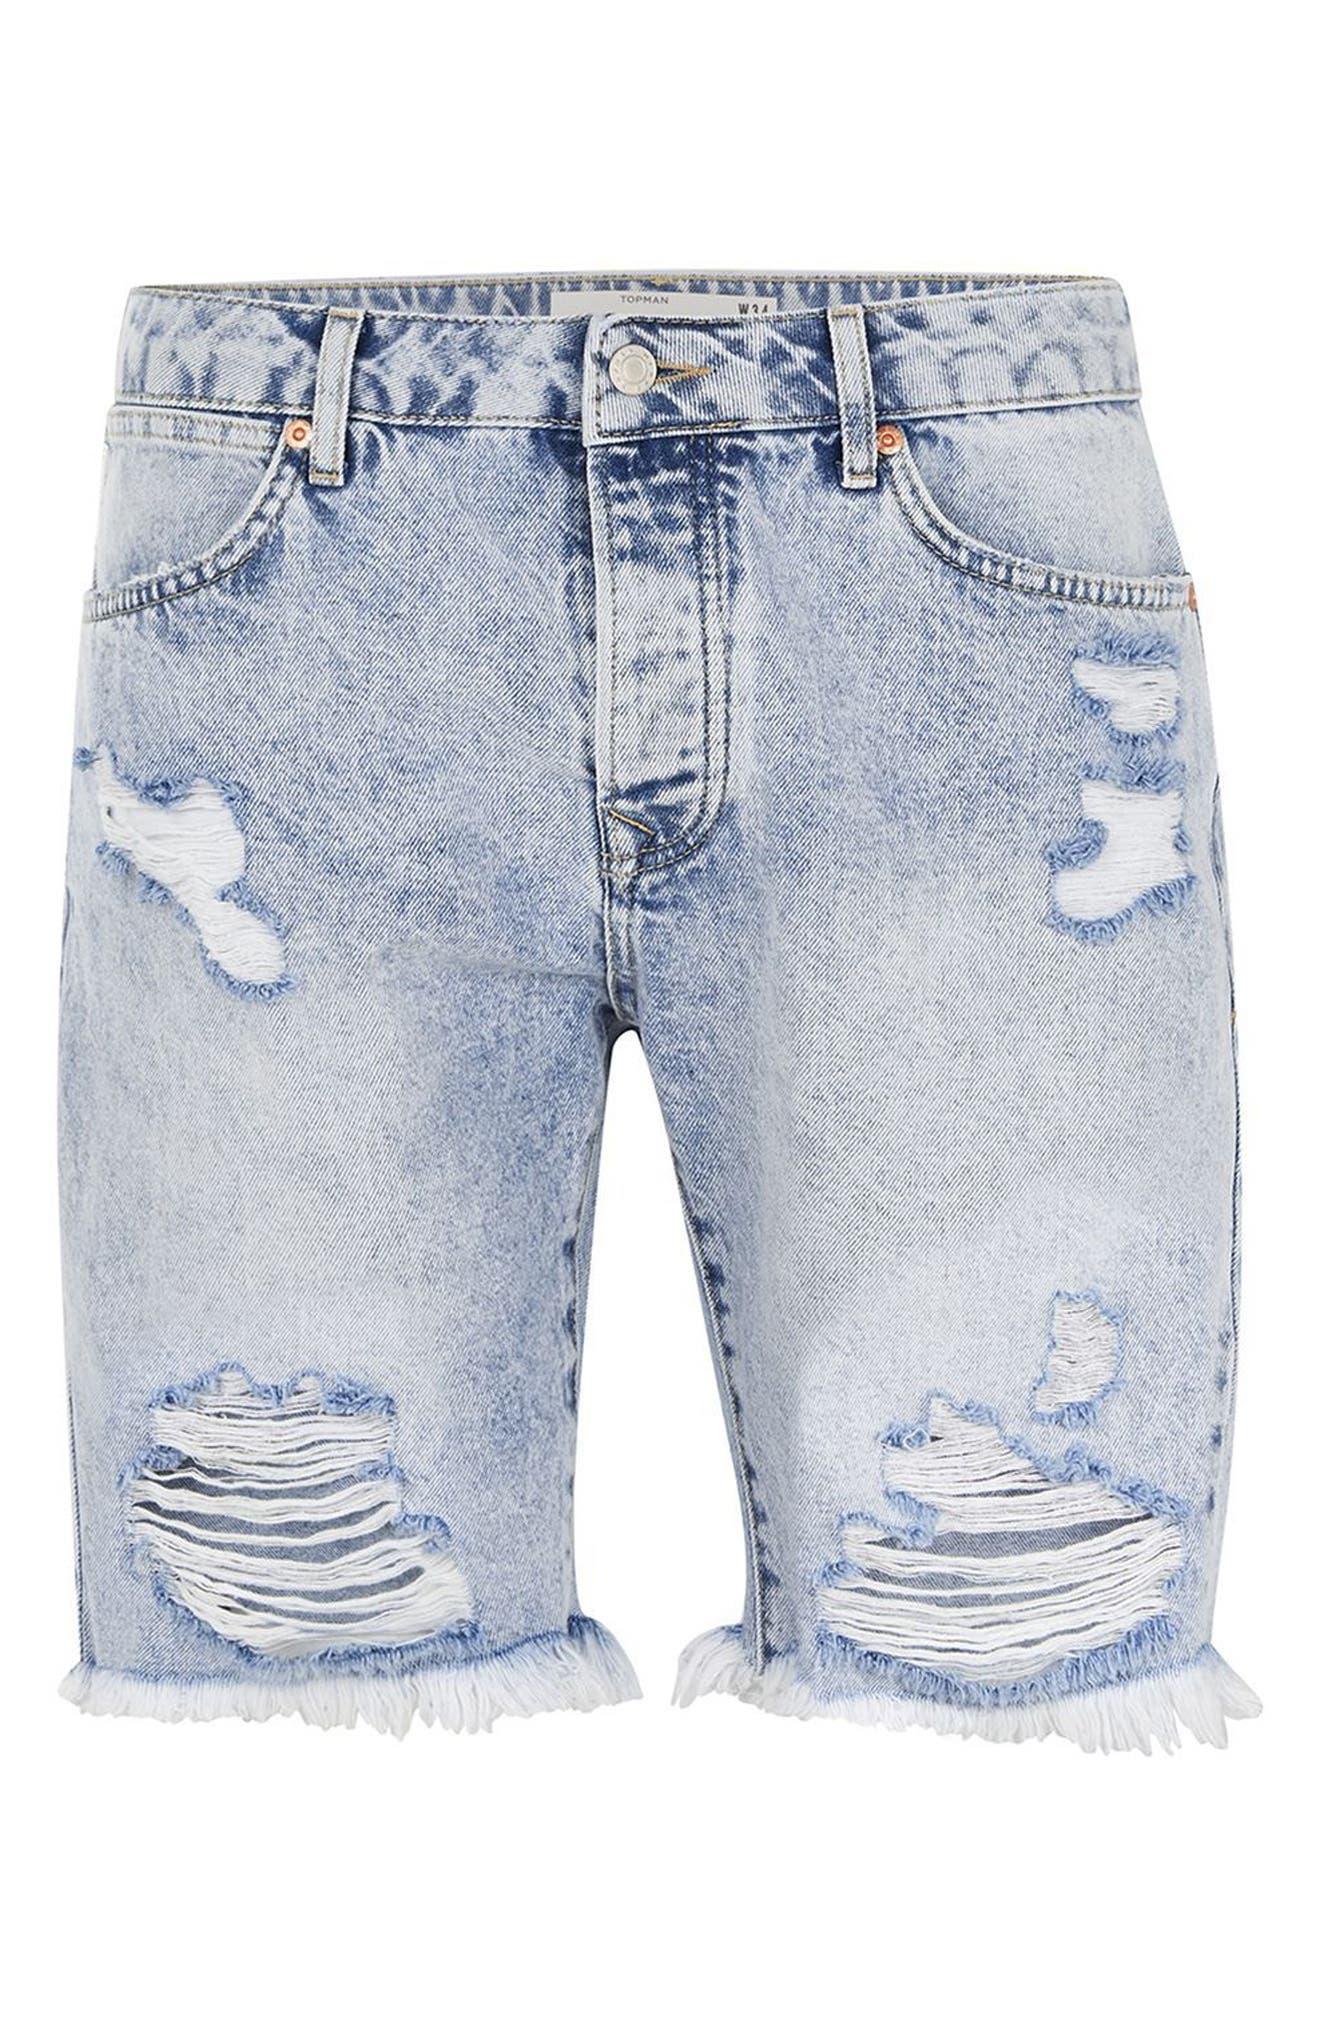 Slim Fit Ripped Denim Shorts,                             Alternate thumbnail 4, color,                             Light Blue